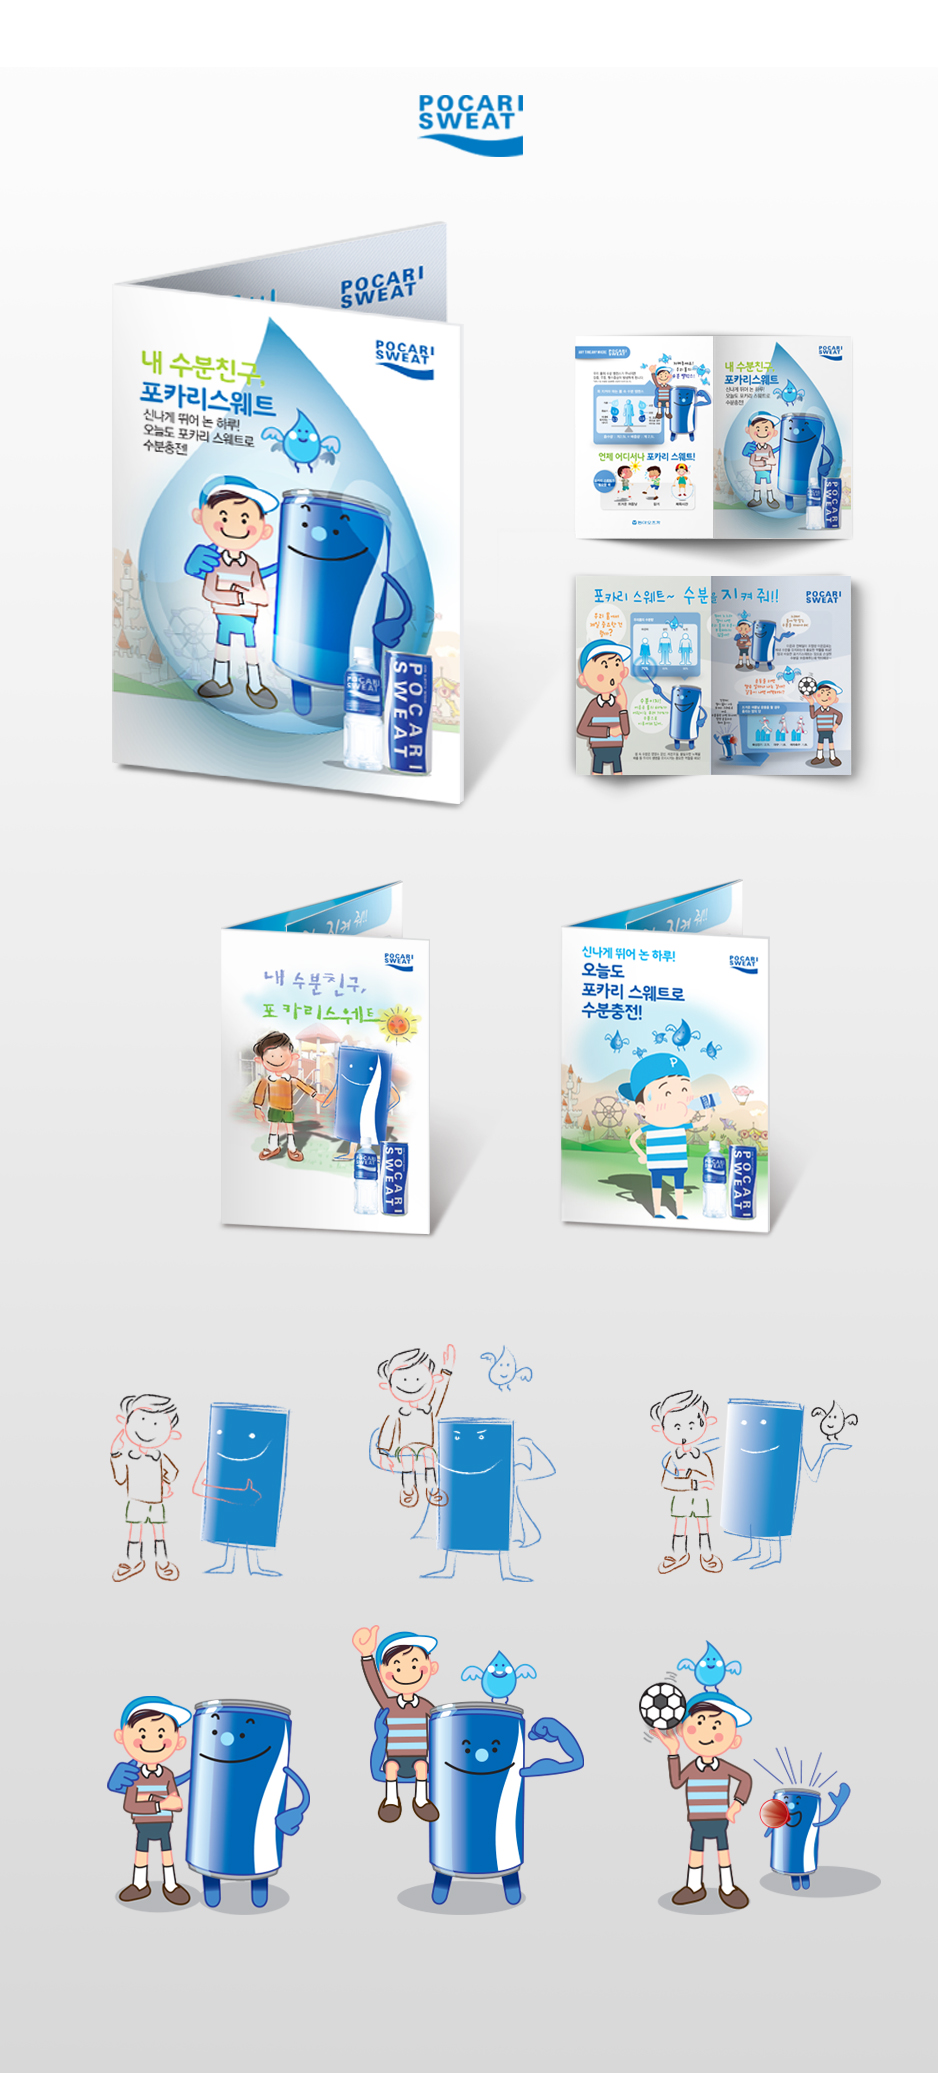 2018_dongaotsuka_pocarisweat_kids leaflet